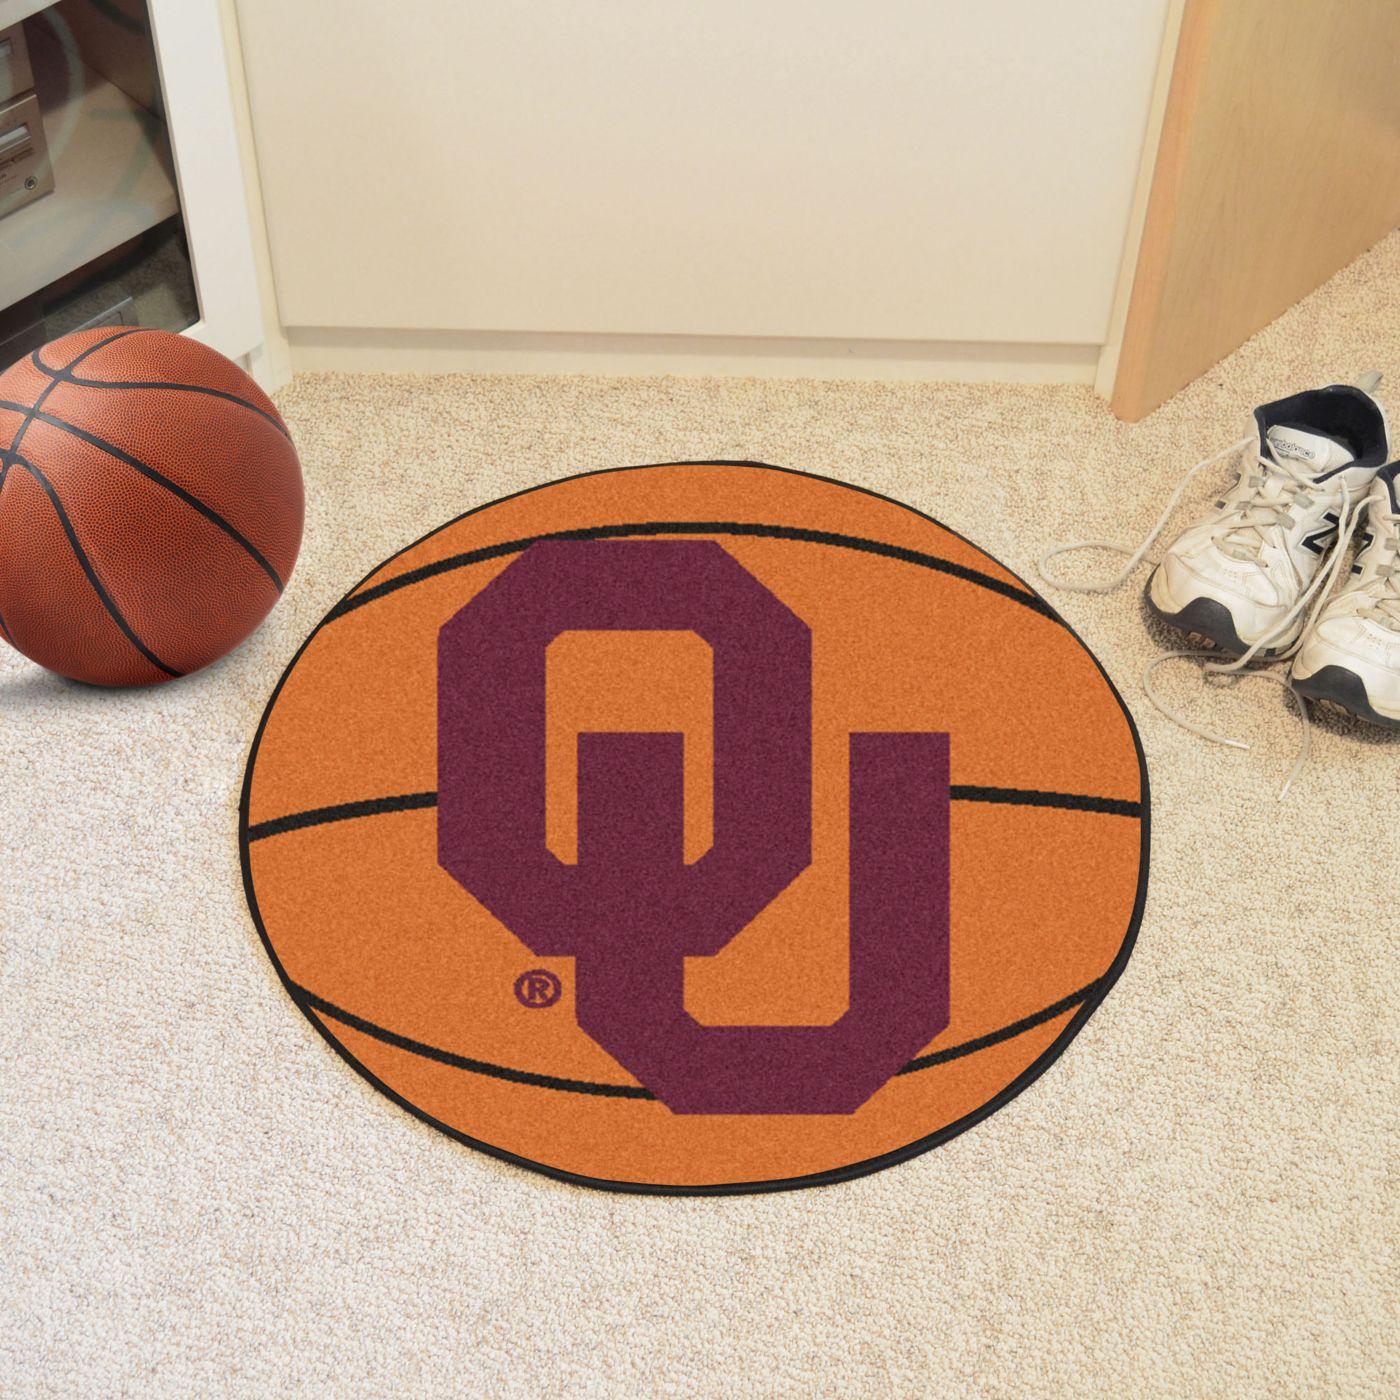 FANMATS Oklahoma Sooners Basketball Mat